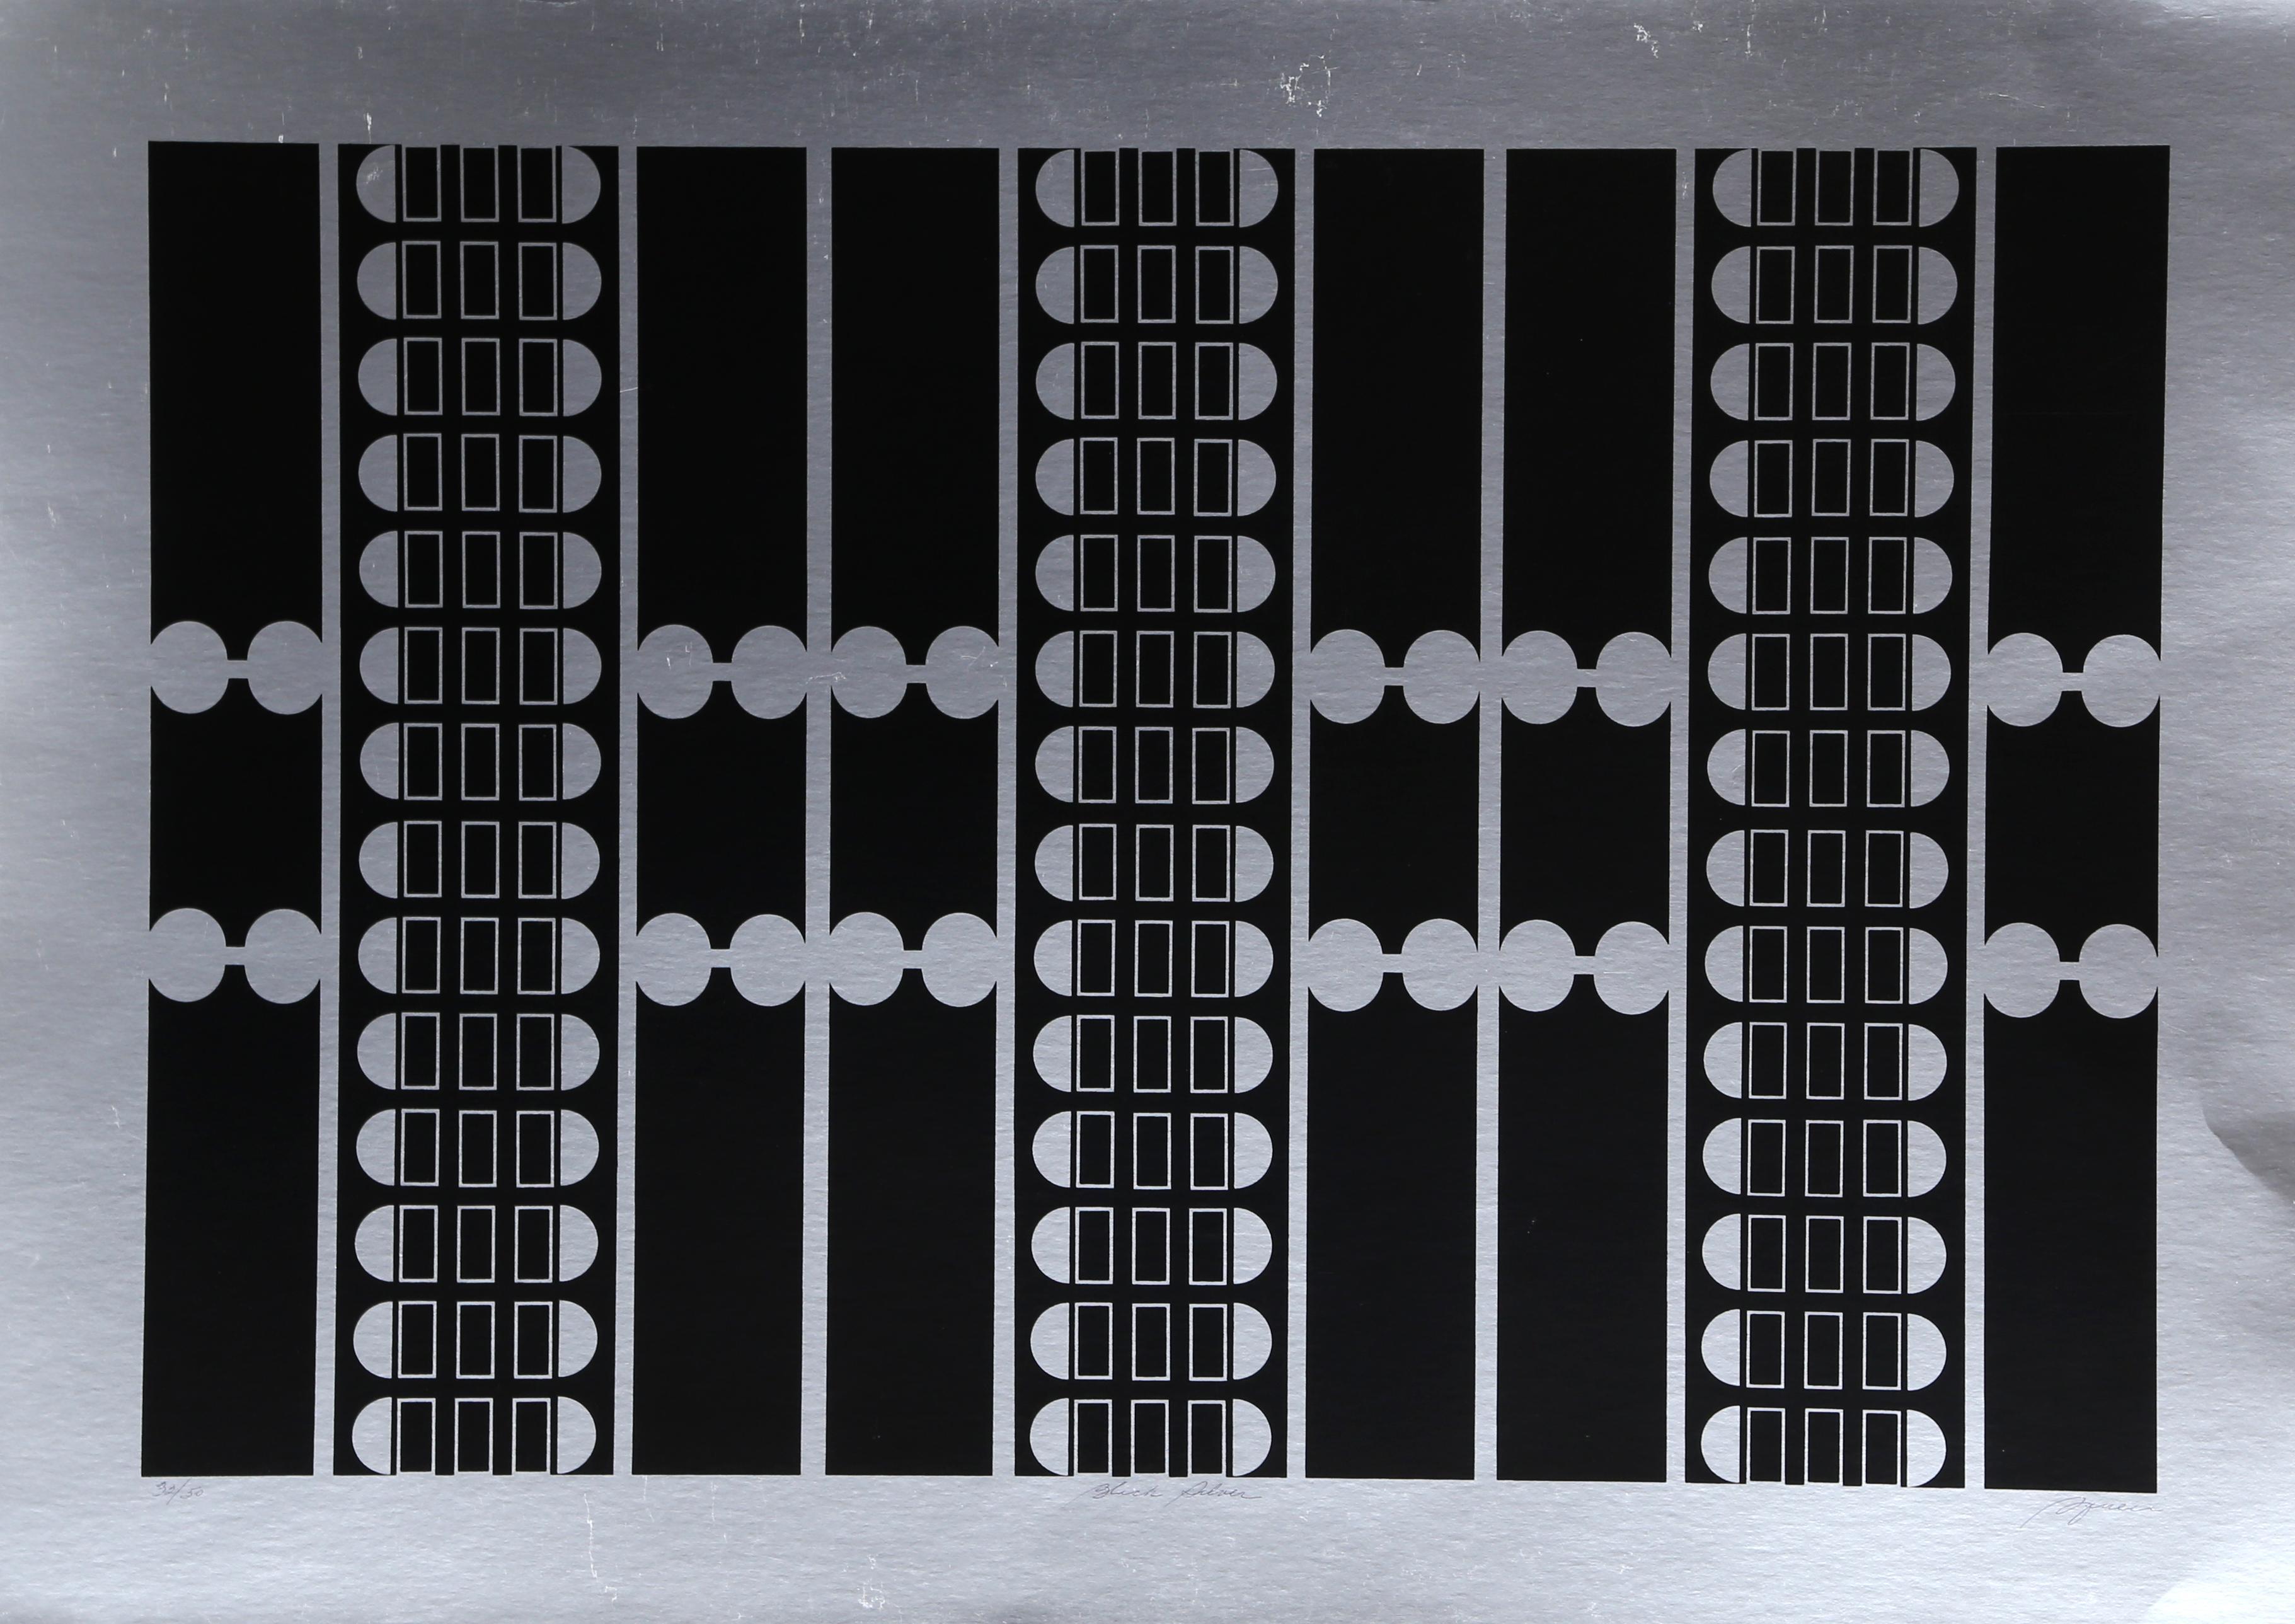 Black Silver, Silkscreen on Foil by Robert Squieri